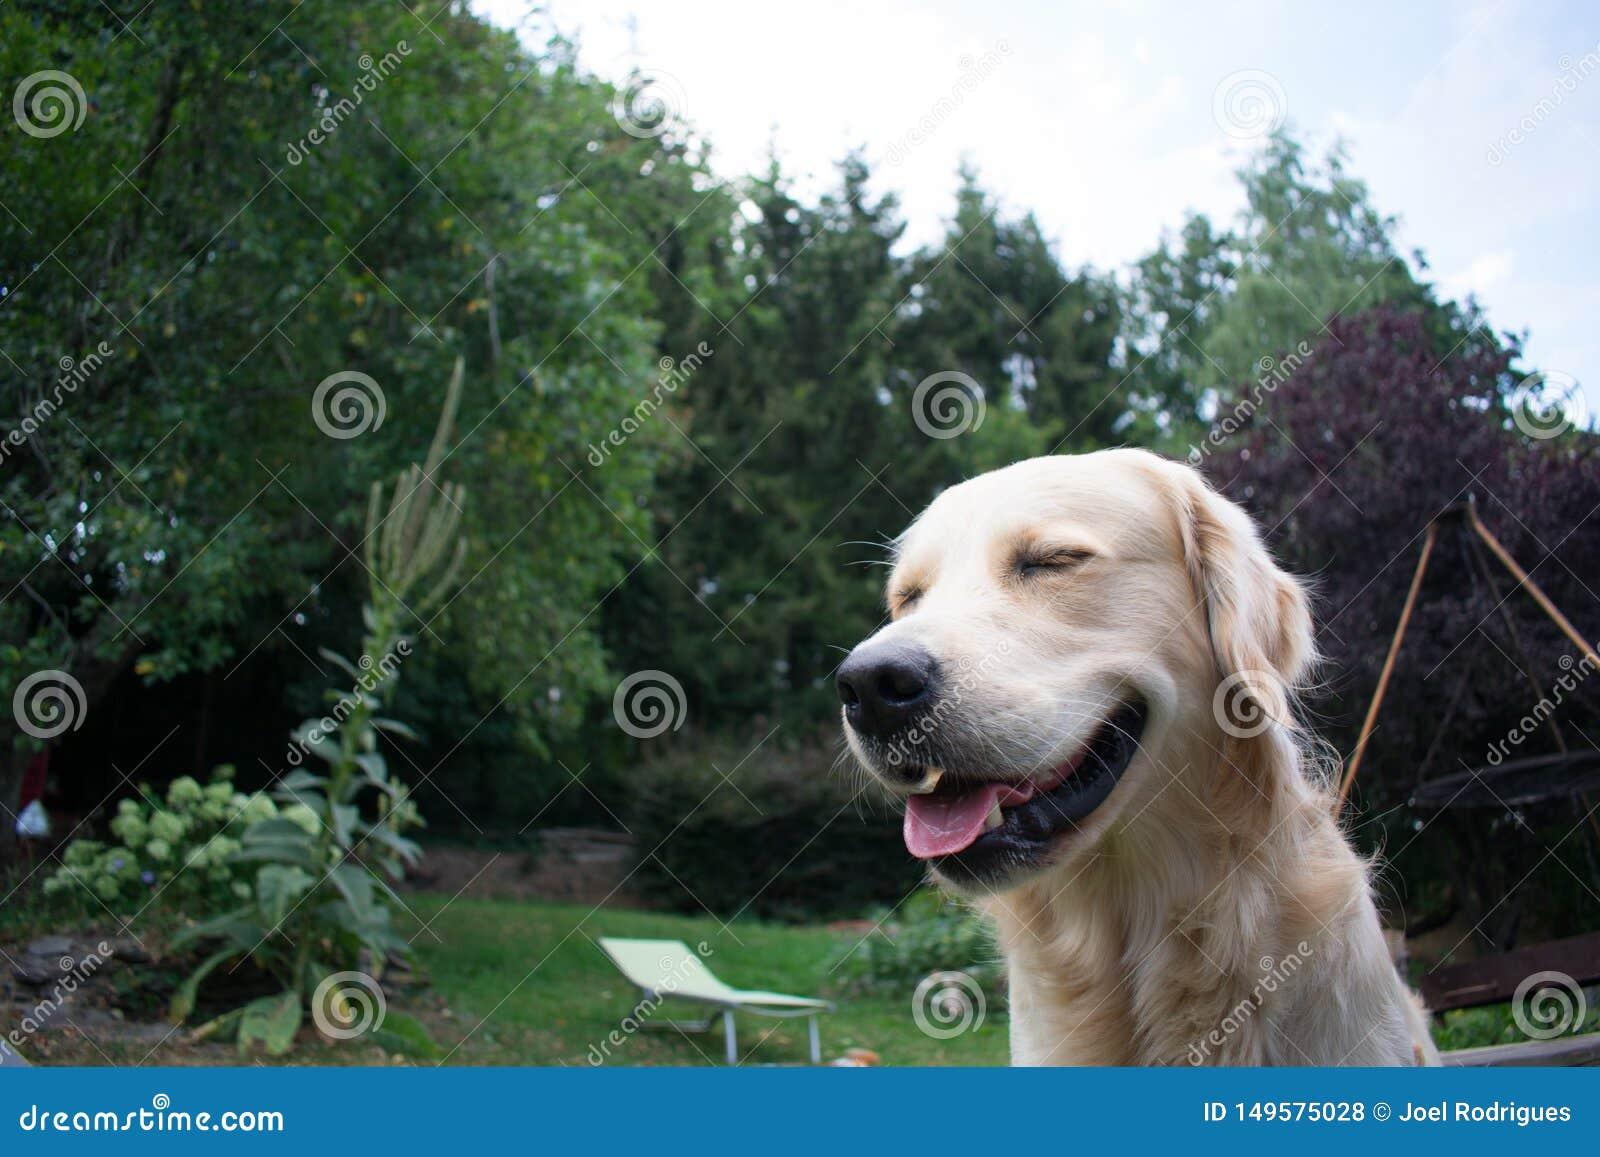 Smiling golden retriever in garden